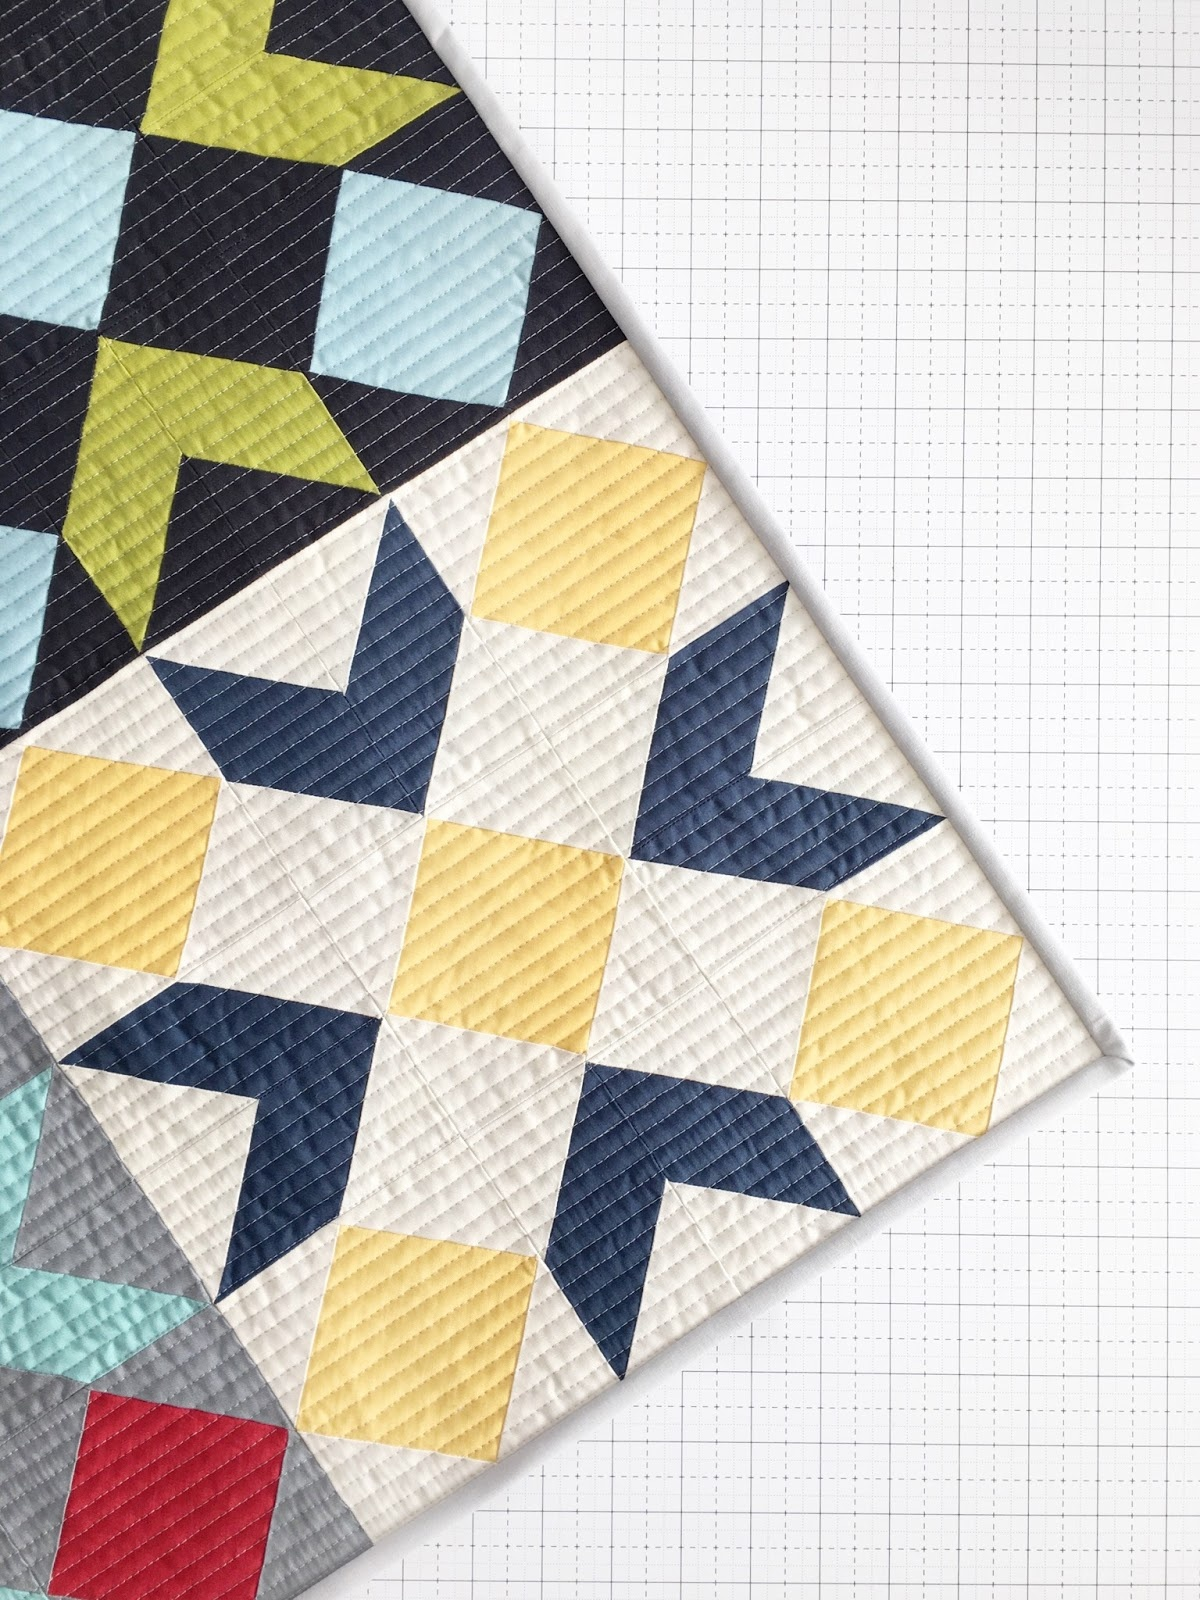 Canoe Ridge Creations: Two Modern Barn Mini Quilts | #finishit2019 - Free Printable Barn Quilt Patterns